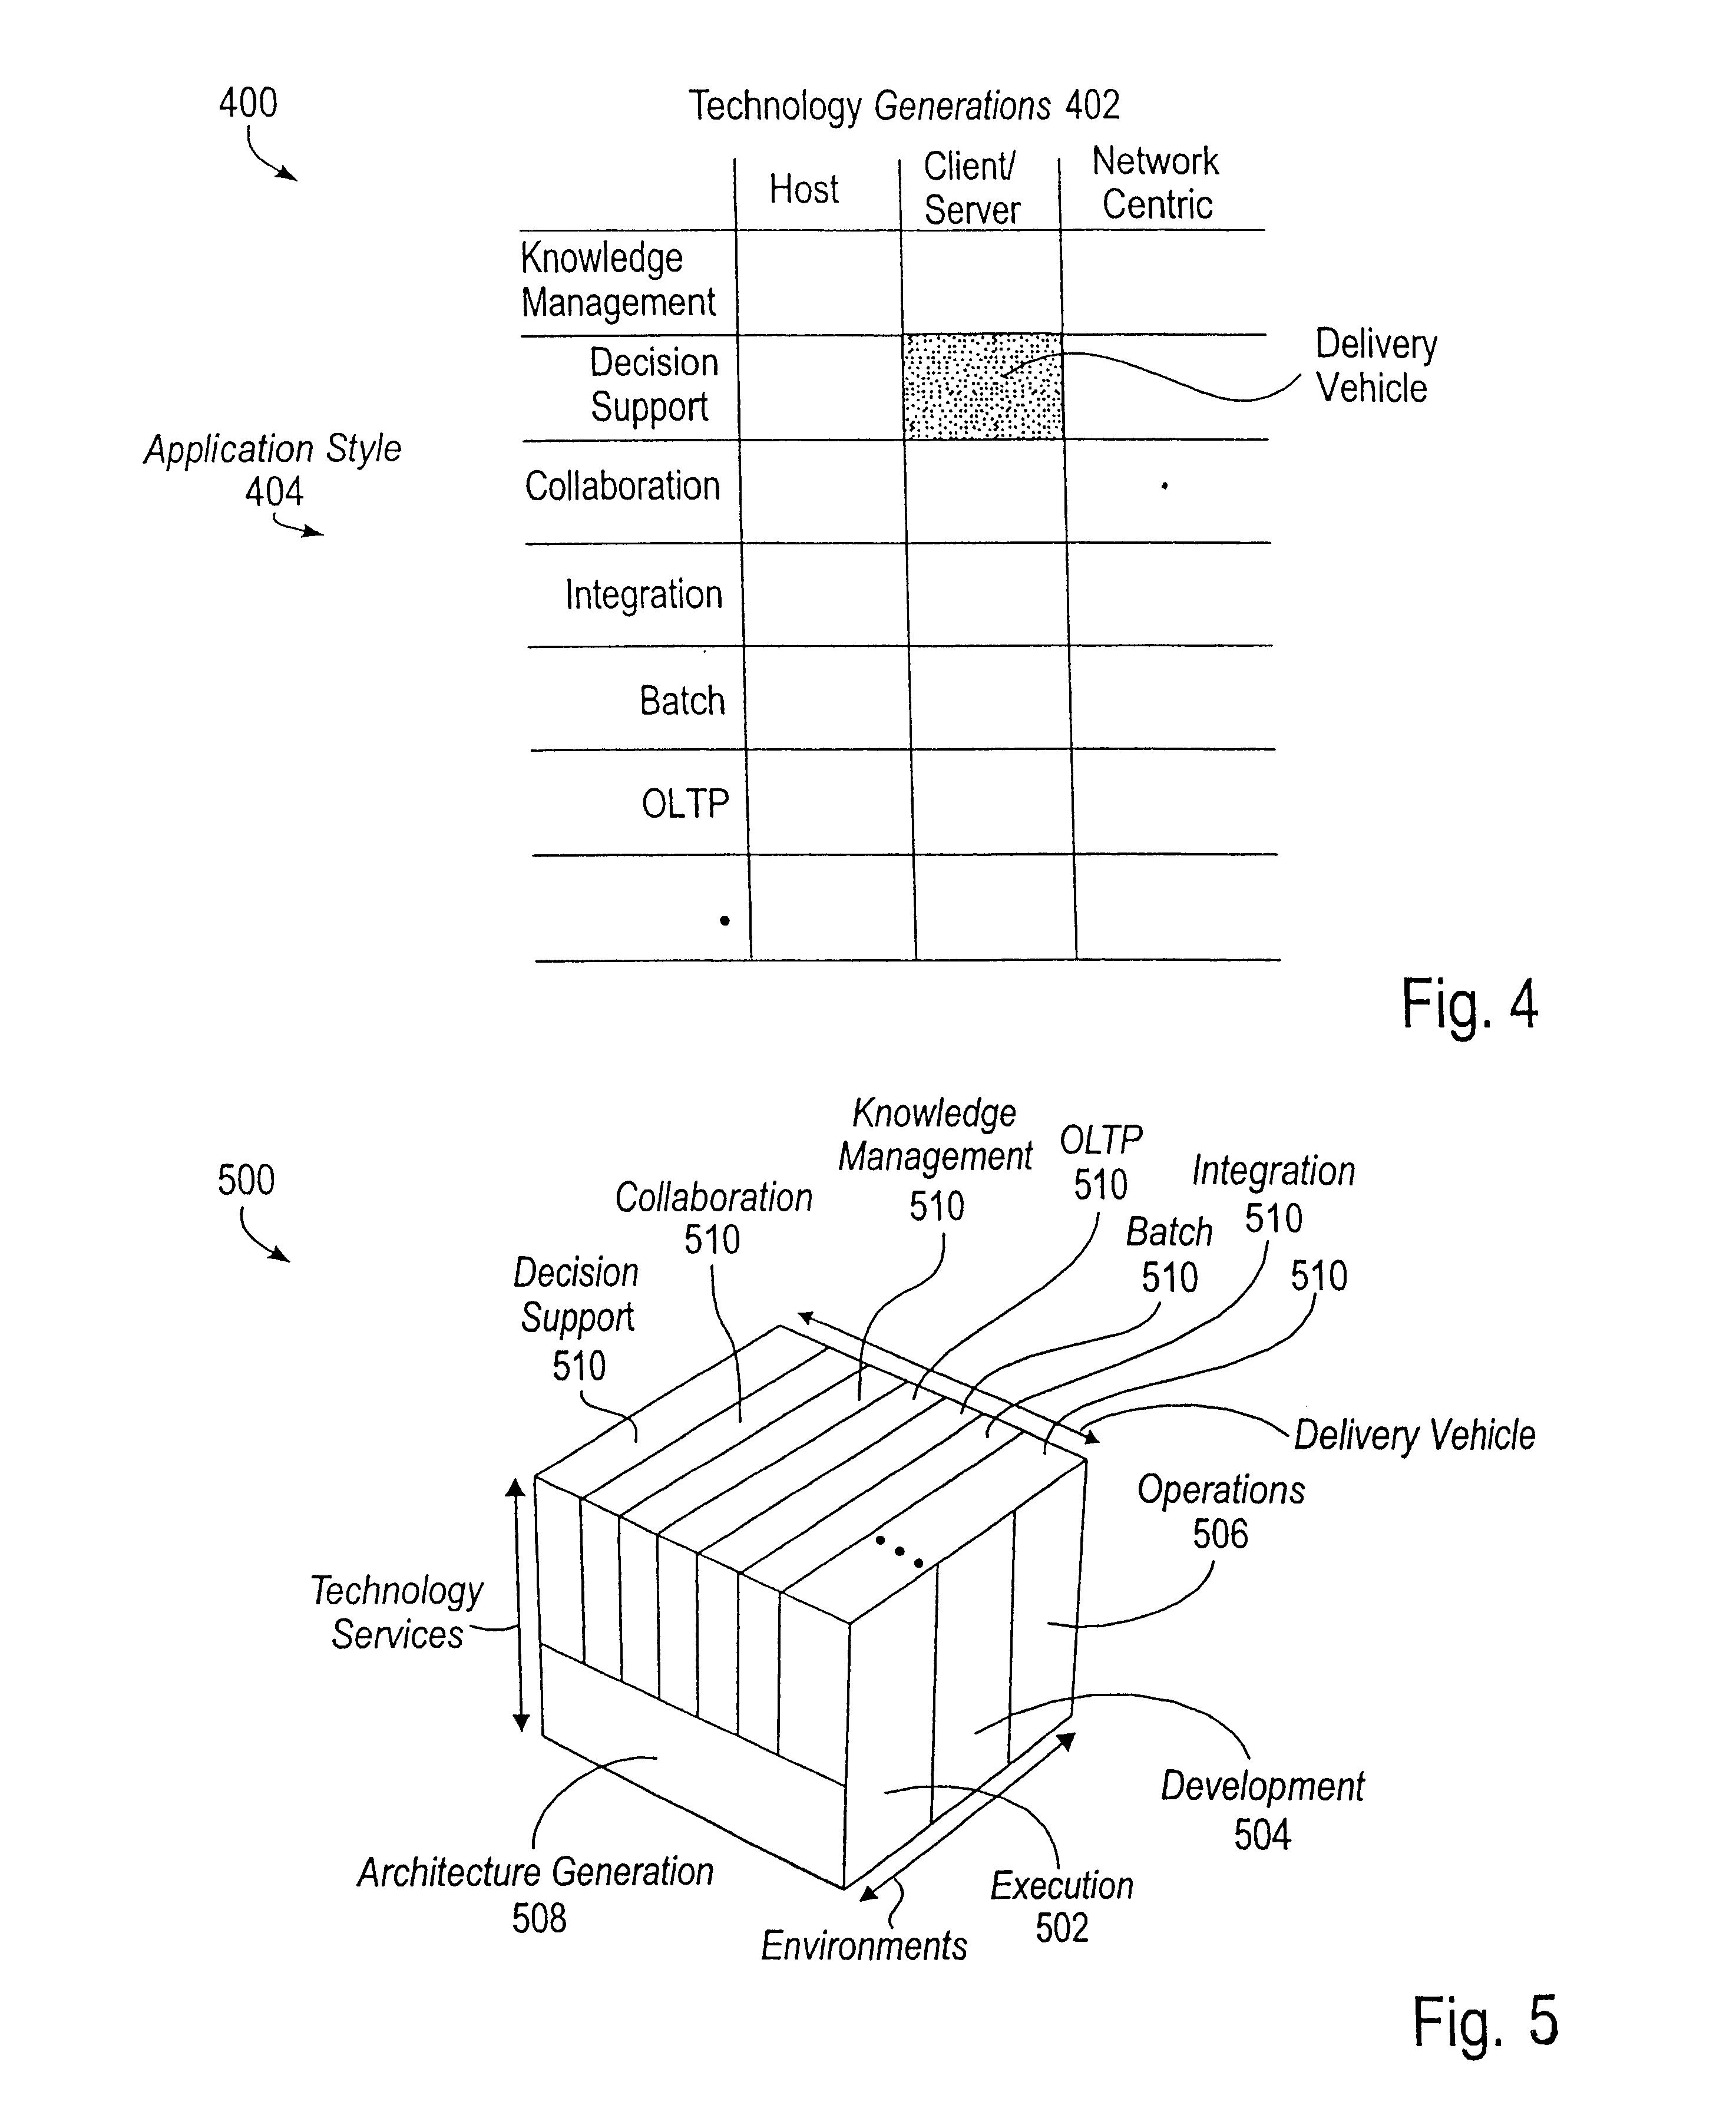 Patent US 6,529,948 B1